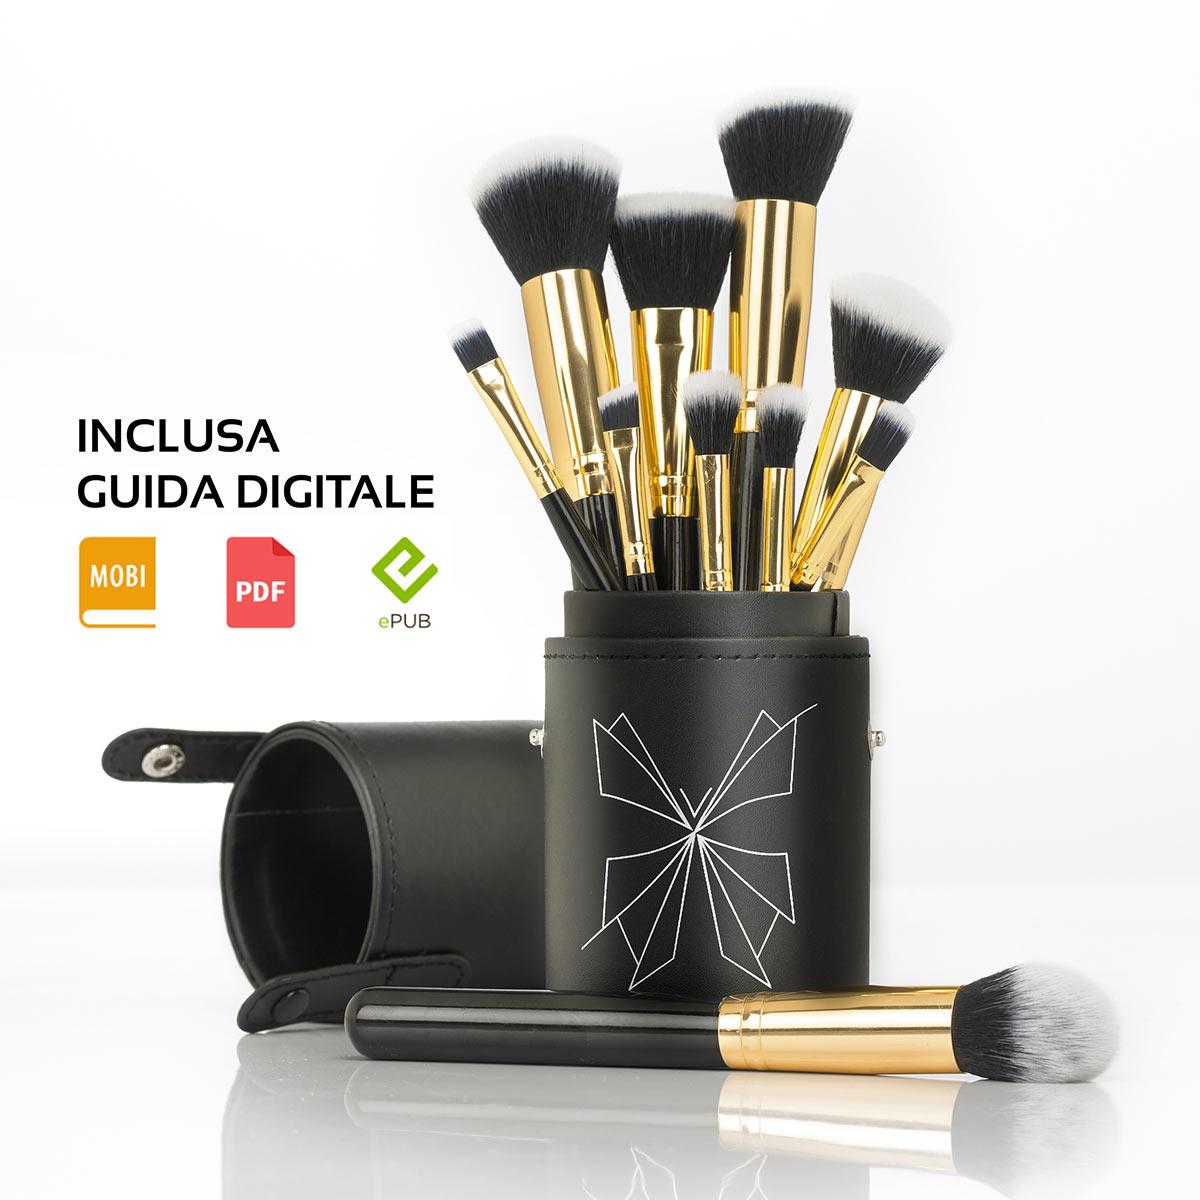 Federico_Balmas_Fotografia_Blog_Fotografo_eCommerce_Amazon_Torino_23_0